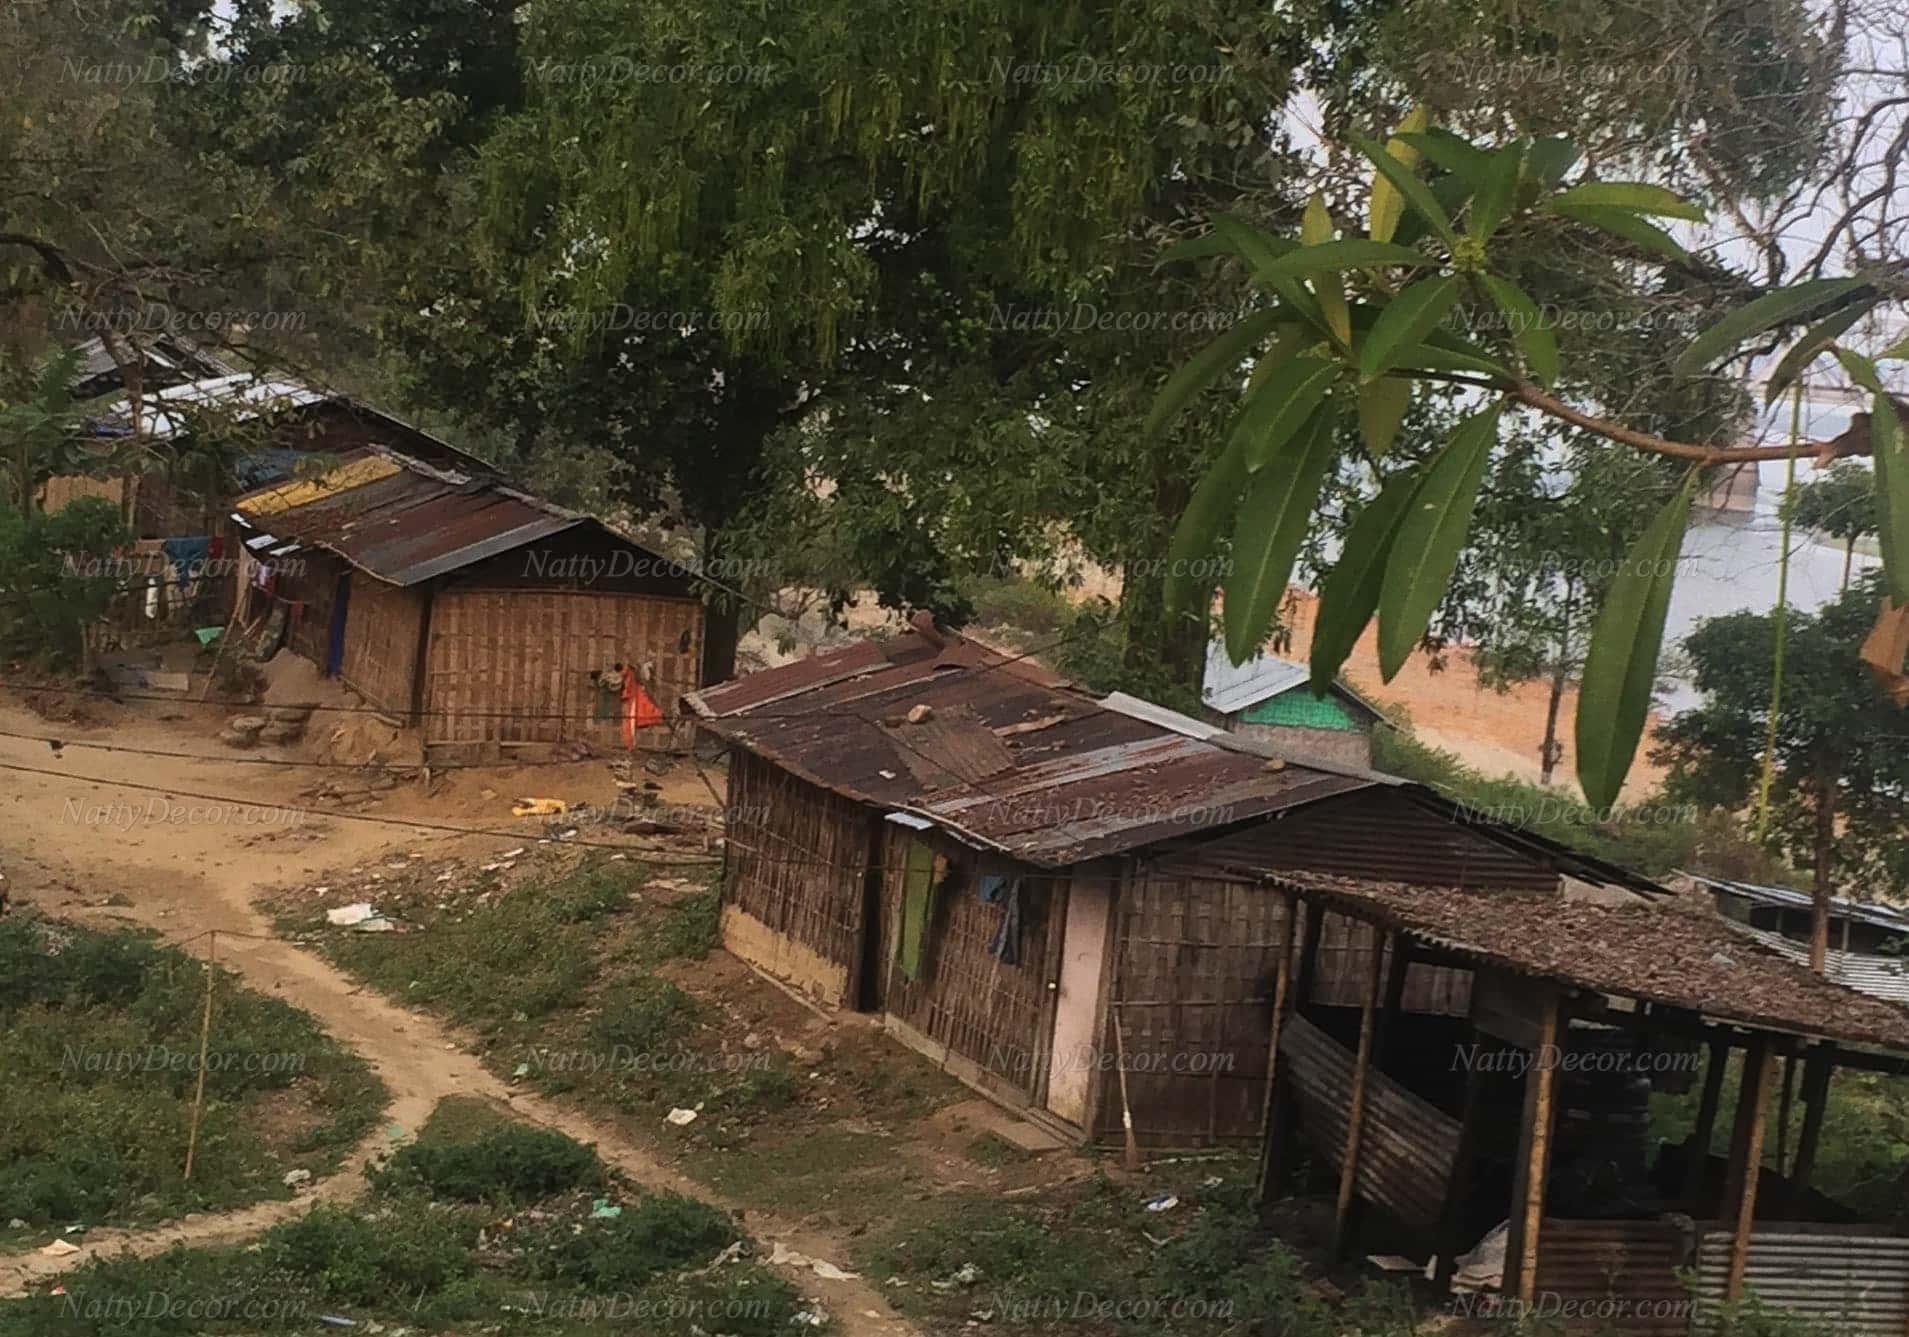 image of a hut